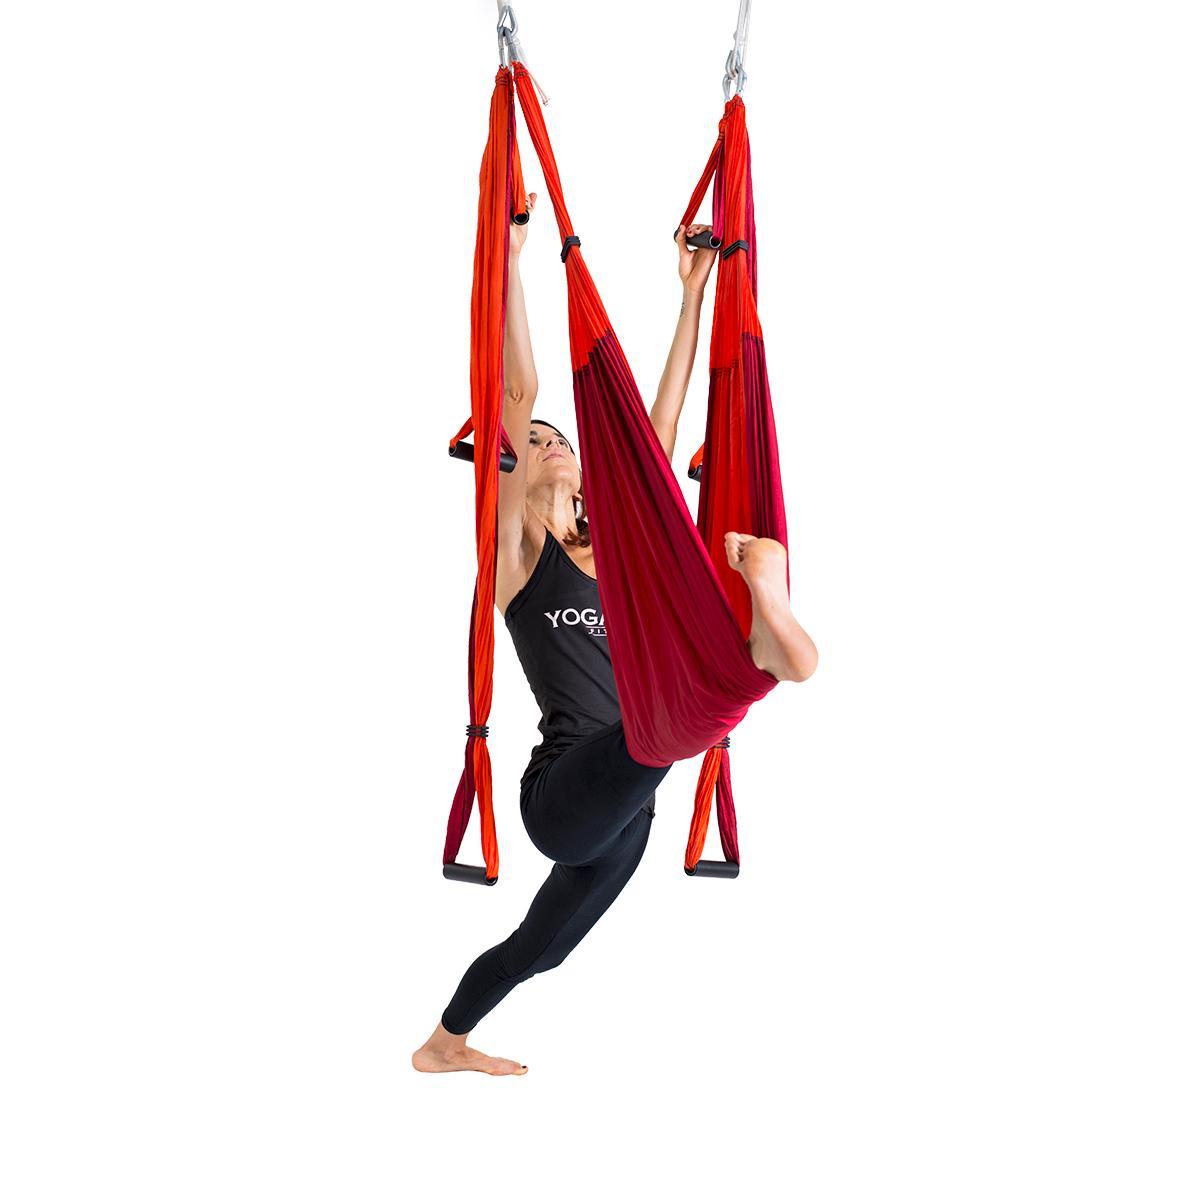 Amazon.com : YOGABODY Naturals Yoga Trapeze-Yoga Swing